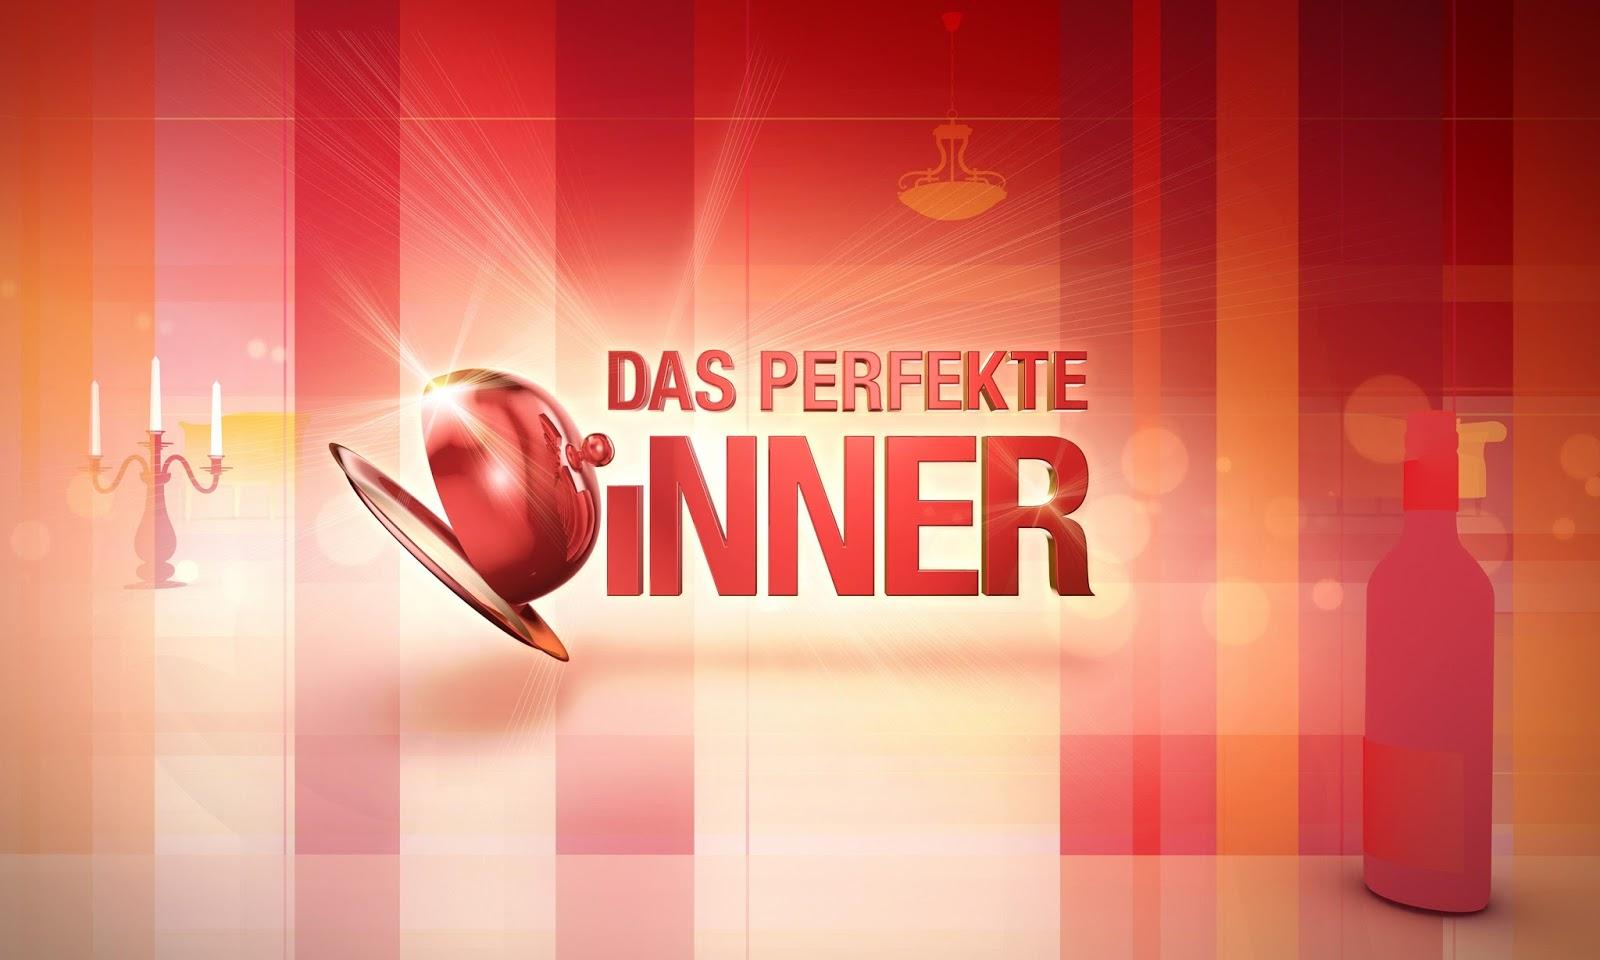 www.das perfekte dinner